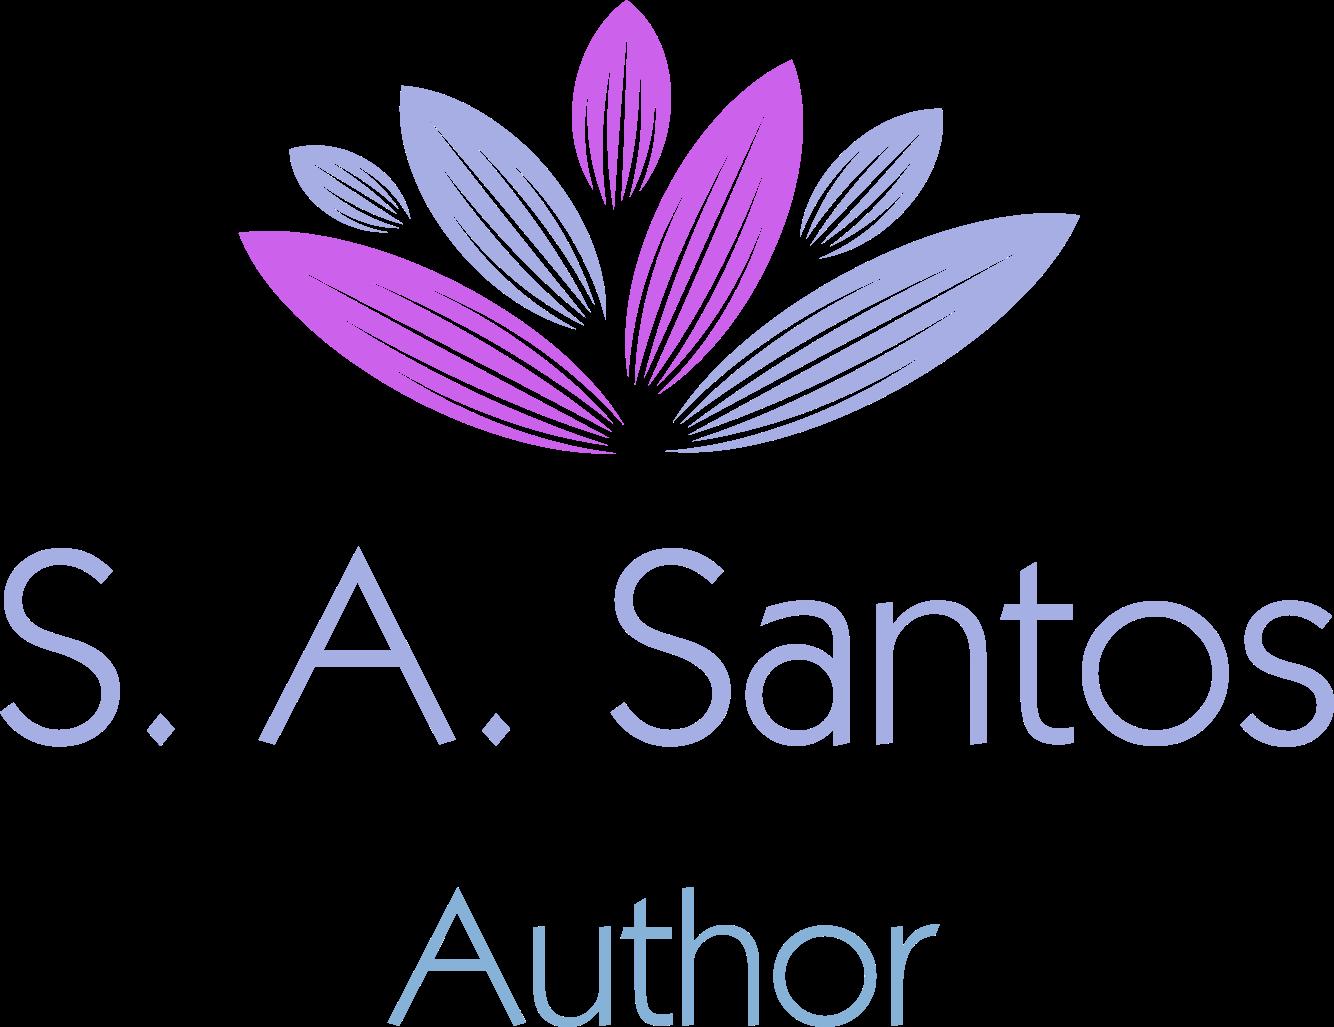 S. A. Santos's Profile Image